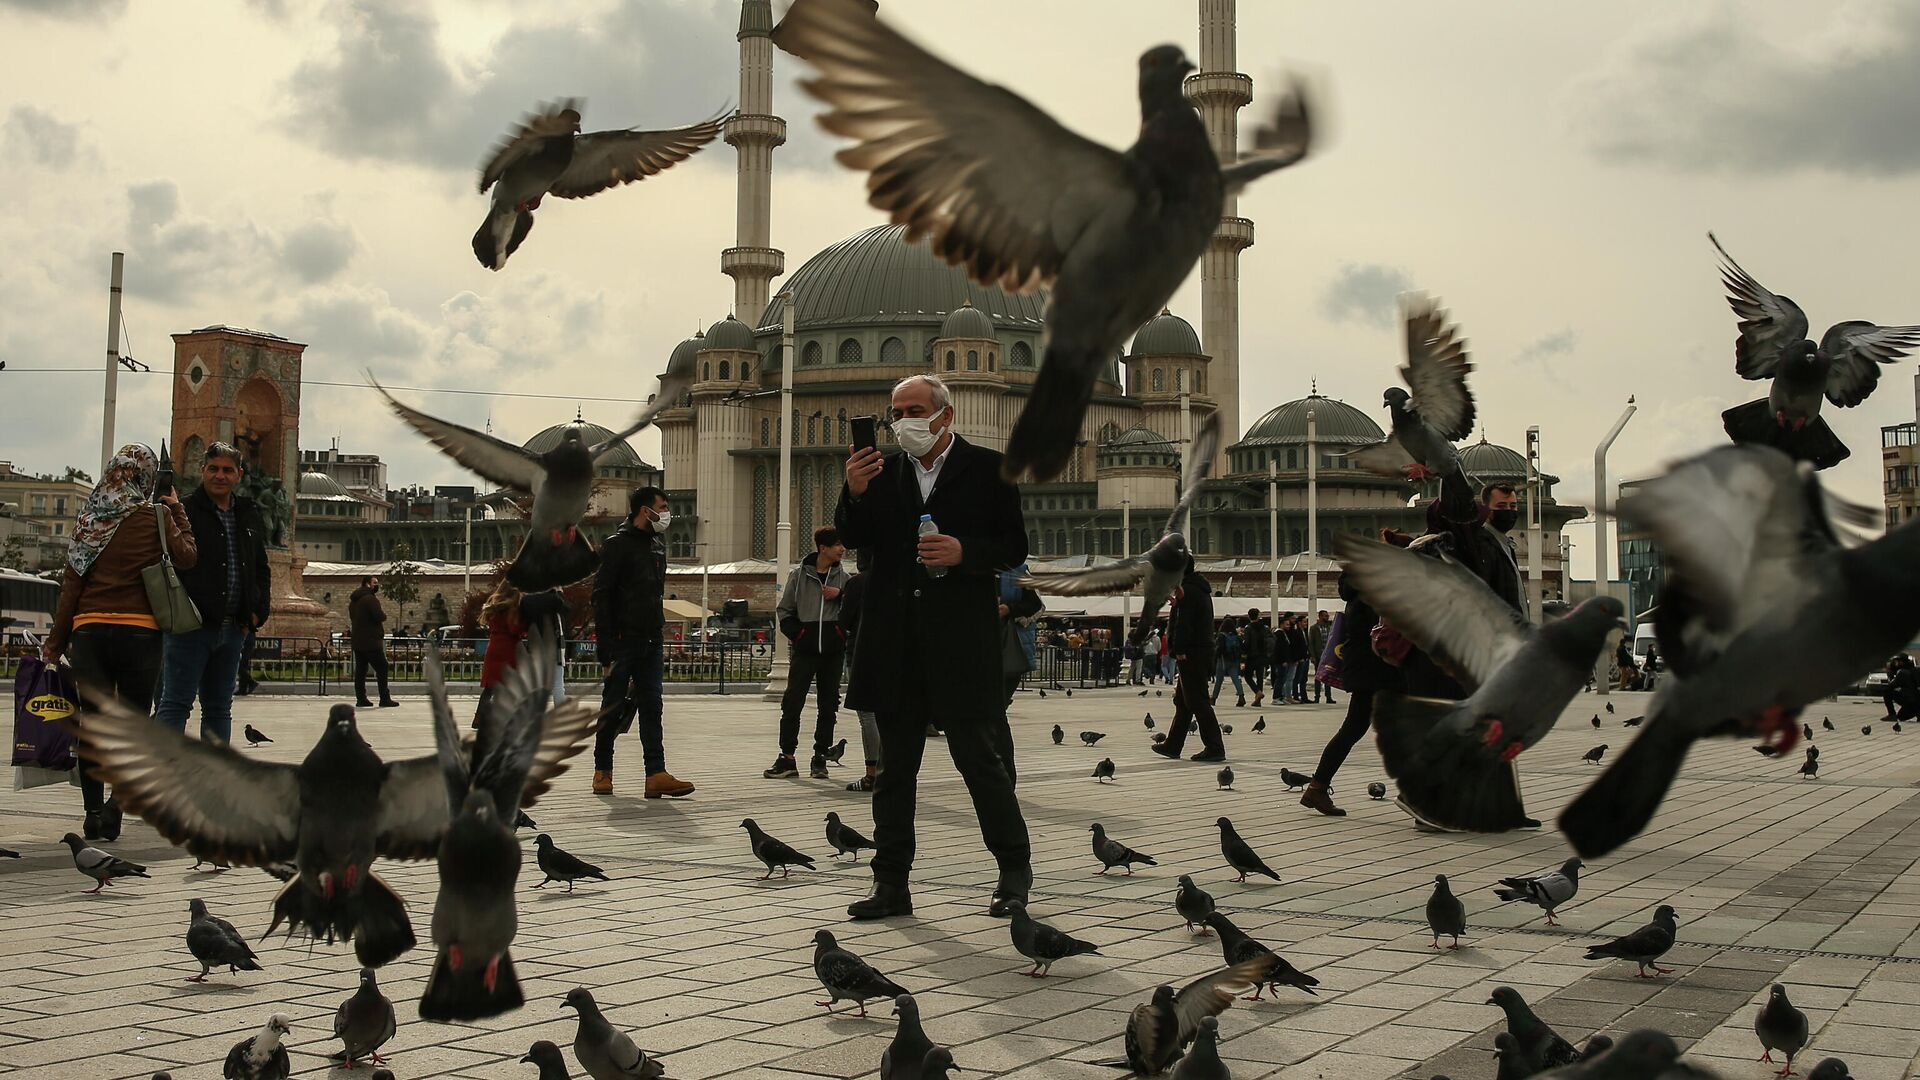 Мужчина кормит голубей на площади Таксим в Стамбуле - РИА Новости, 1920, 12.04.2021